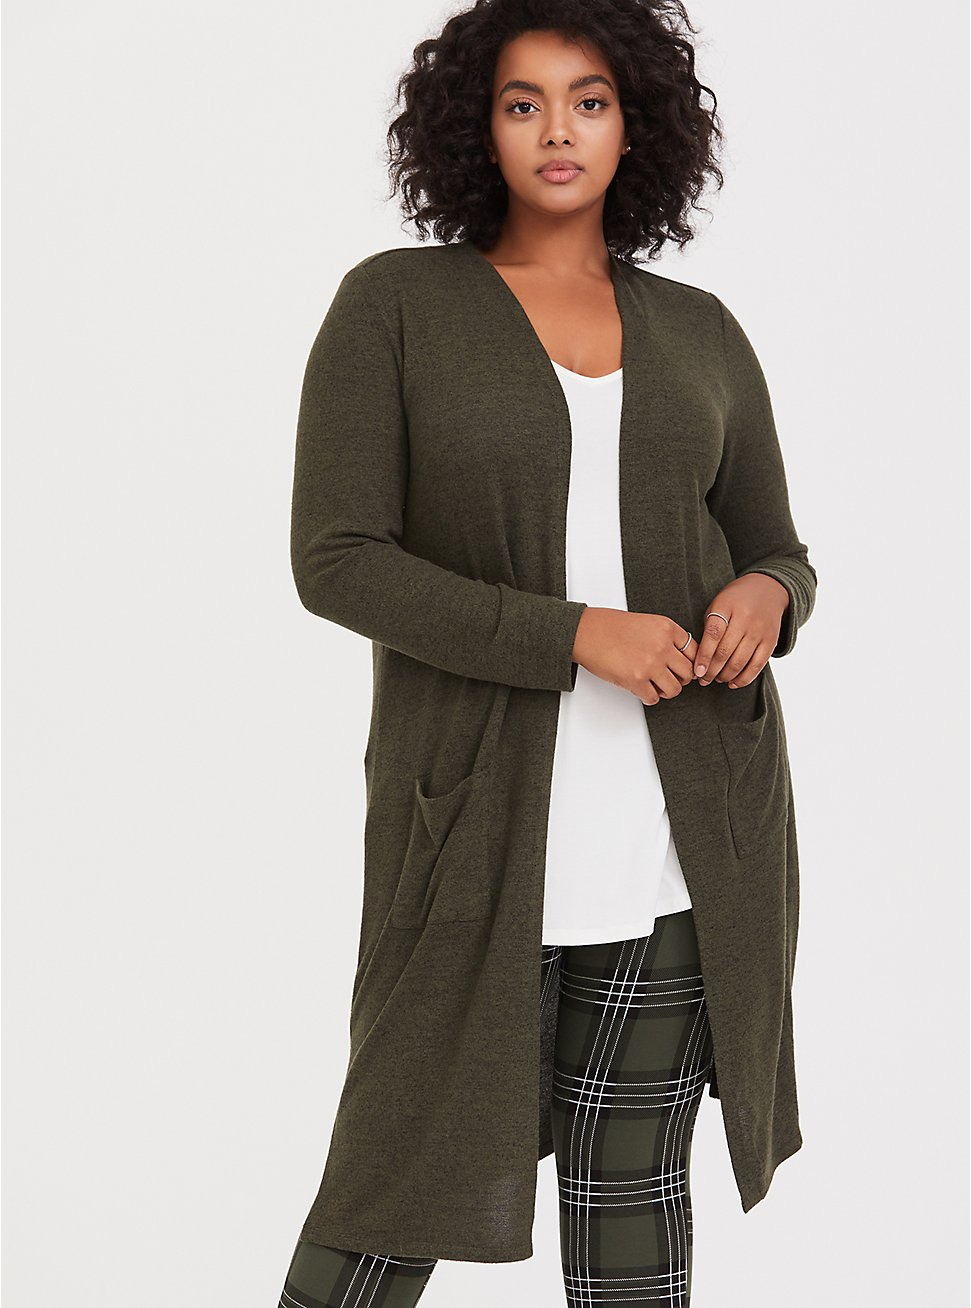 Plus Size Super Soft Plush Olive Green Longline Cardigan, DEEP DEPTHS, hi-res